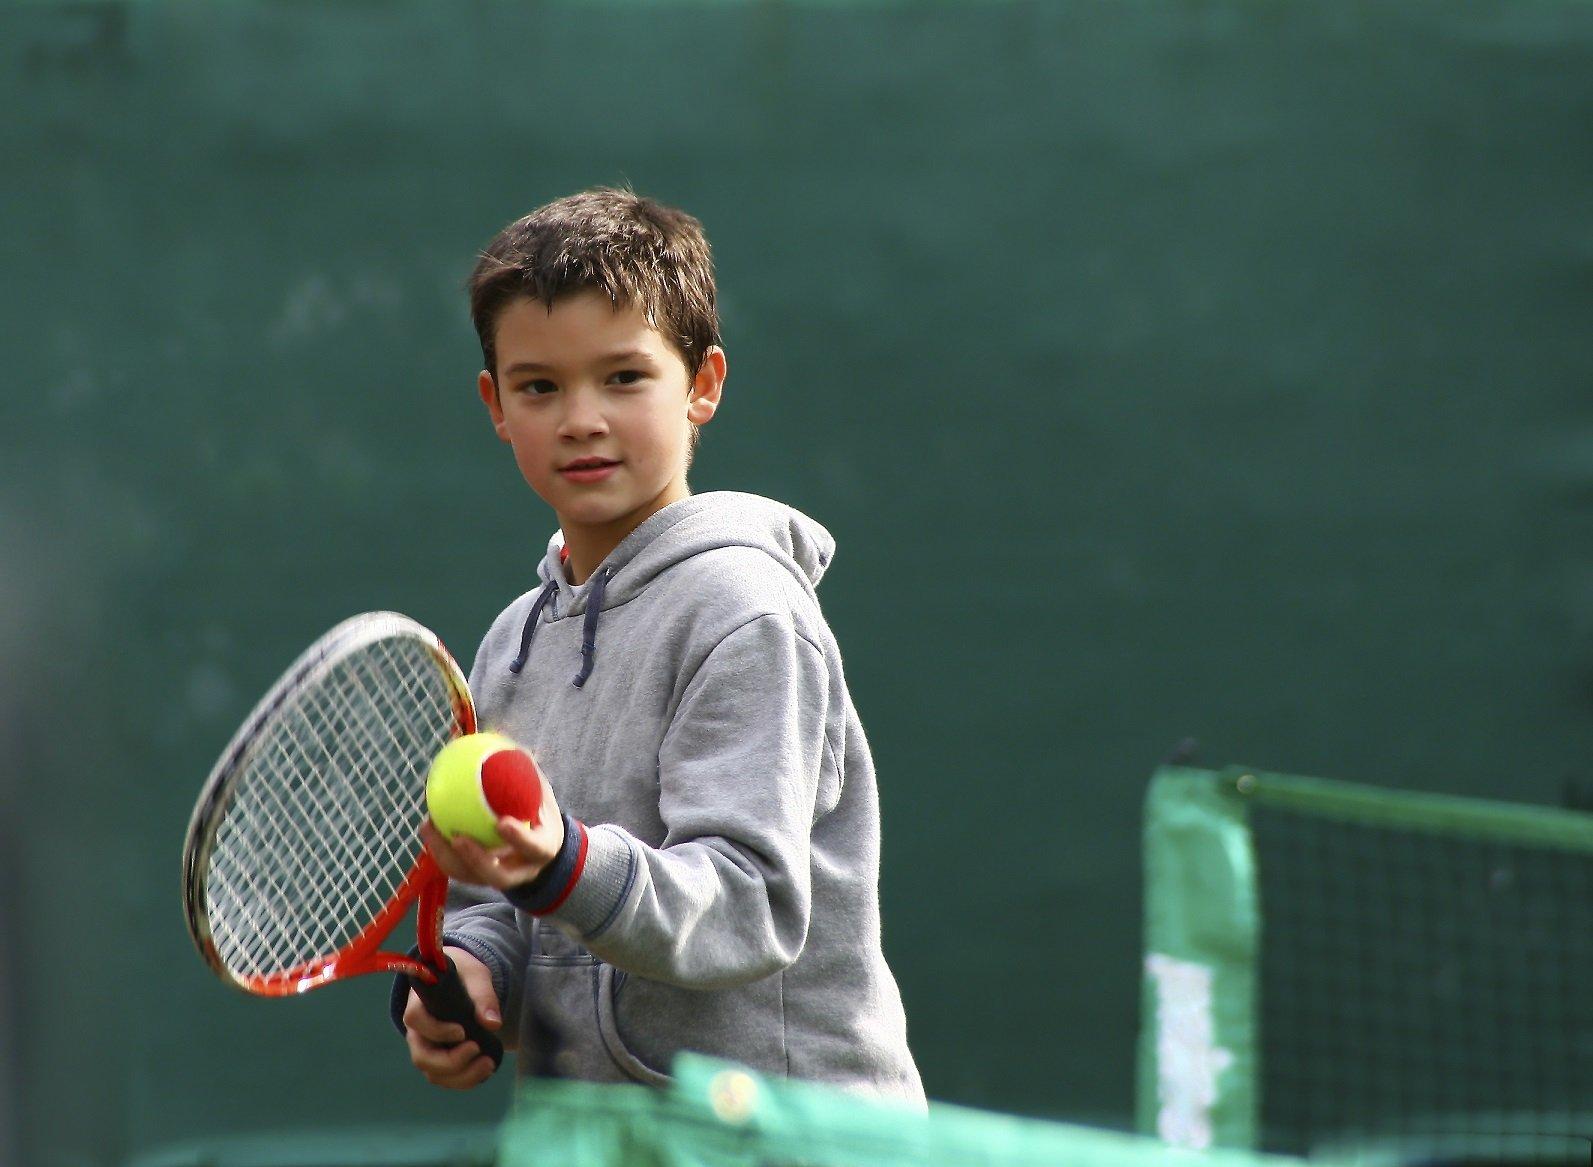 3 Ways to Introduce Kids to Tennis